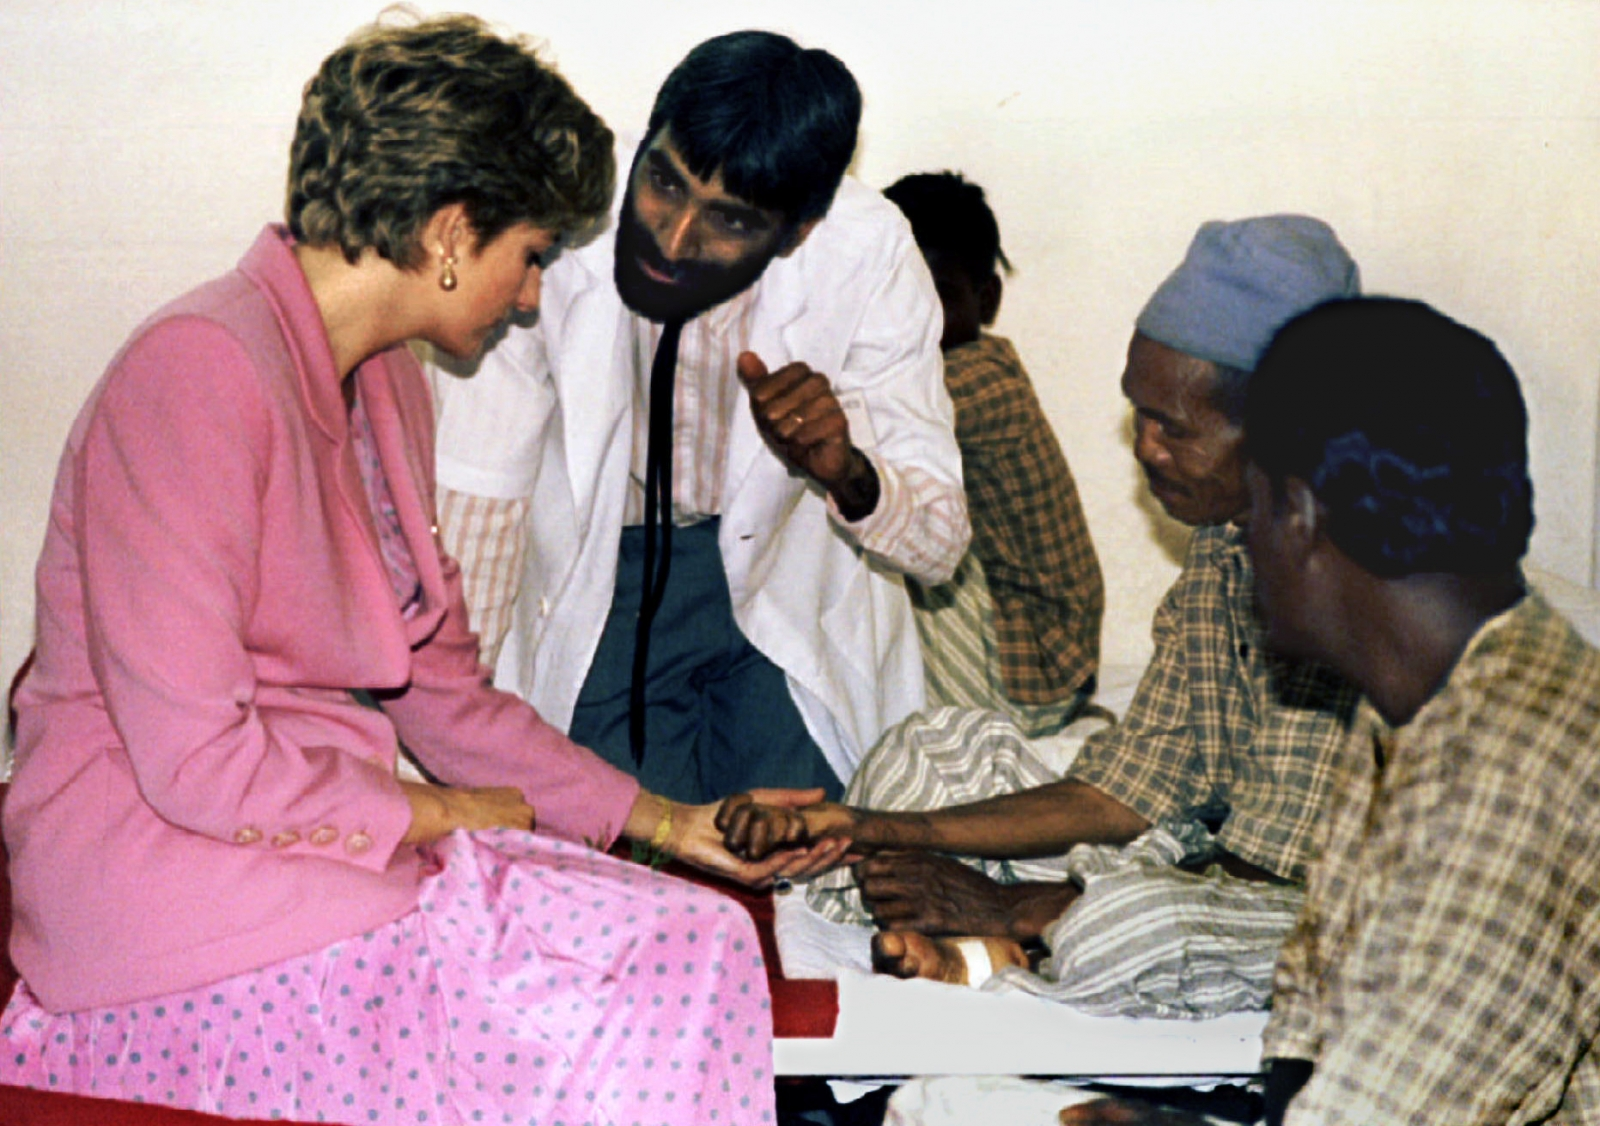 Princess Diana death anniversary 2015: Top 10 heart